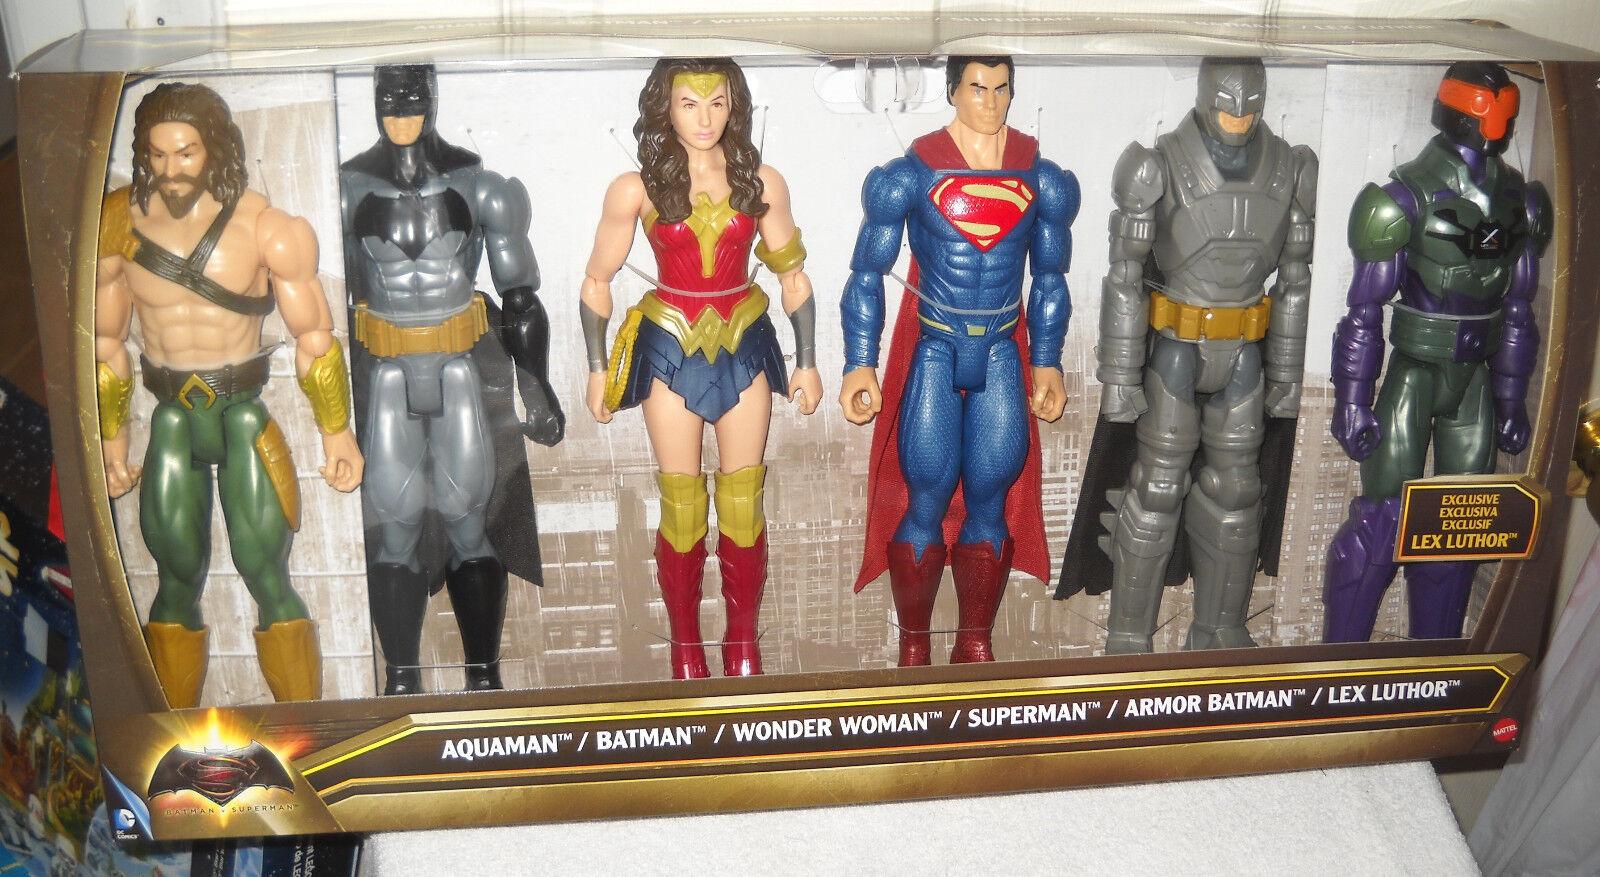 9384 NRFB Mattel Batman Superman 6 Doll Action Figure Set